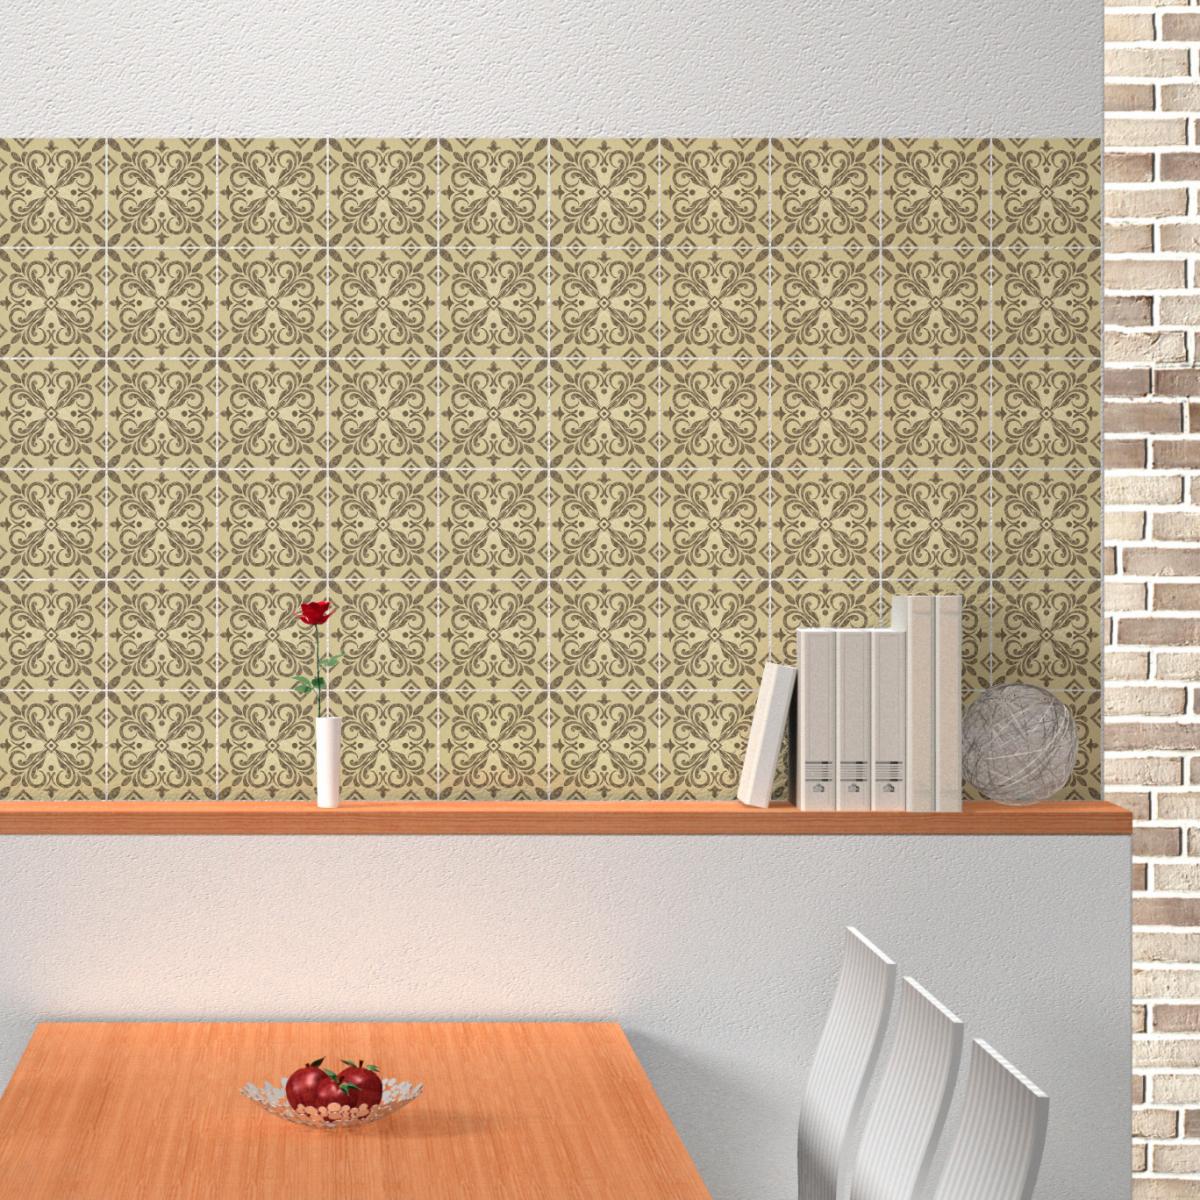 60 stickers carrelages azulejos jordano salle de bain et. Black Bedroom Furniture Sets. Home Design Ideas